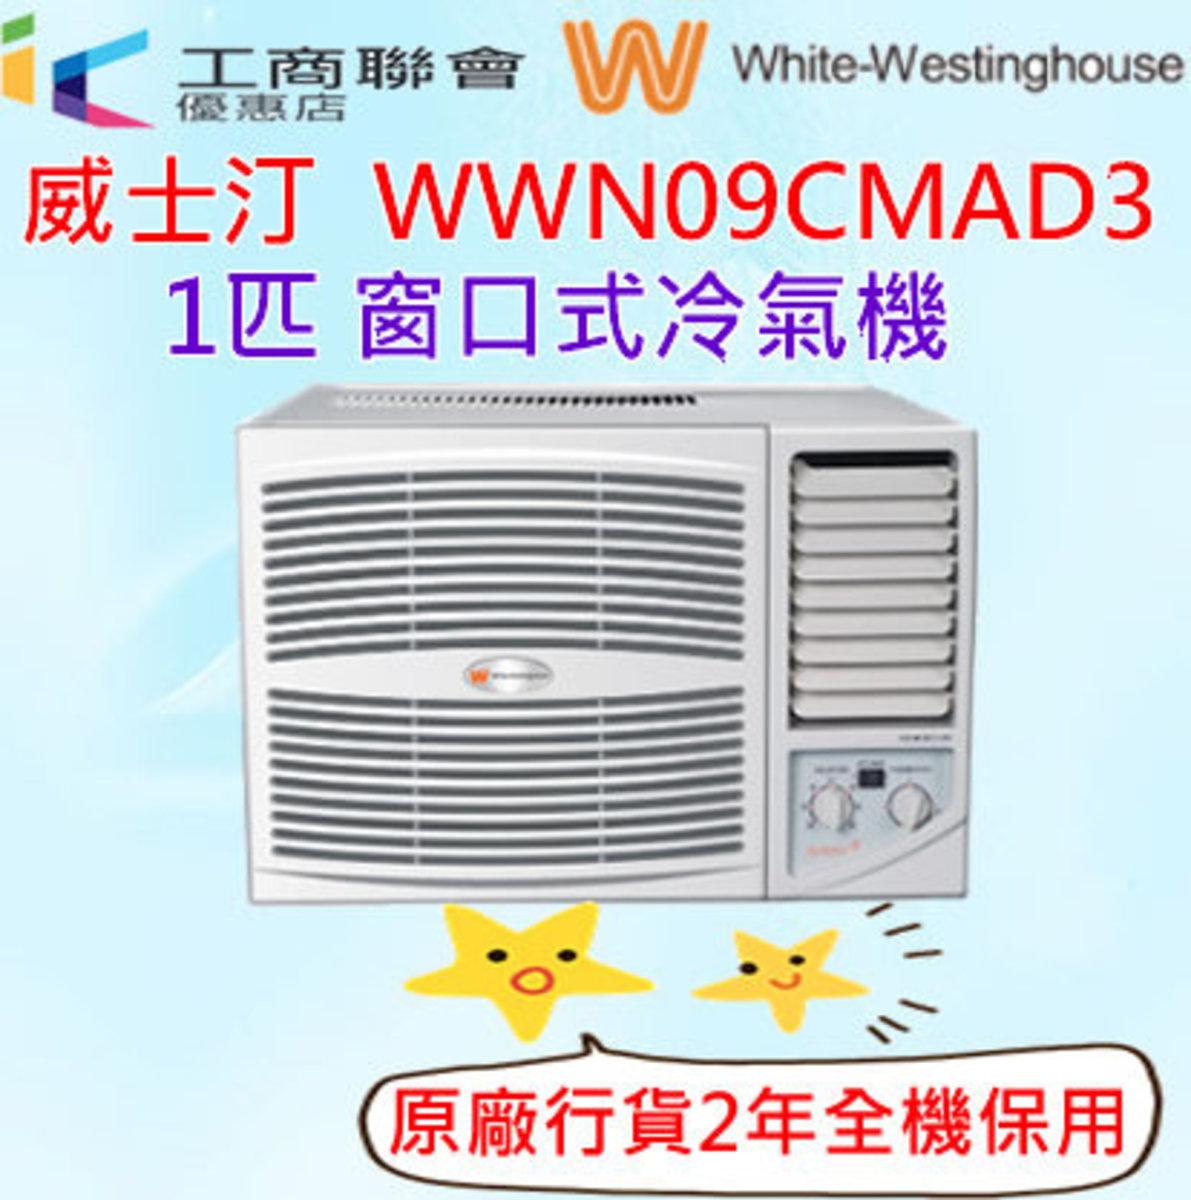 WWN09CMAD3  1匹 淨冷窗口式冷氣機(免費除舊服務)